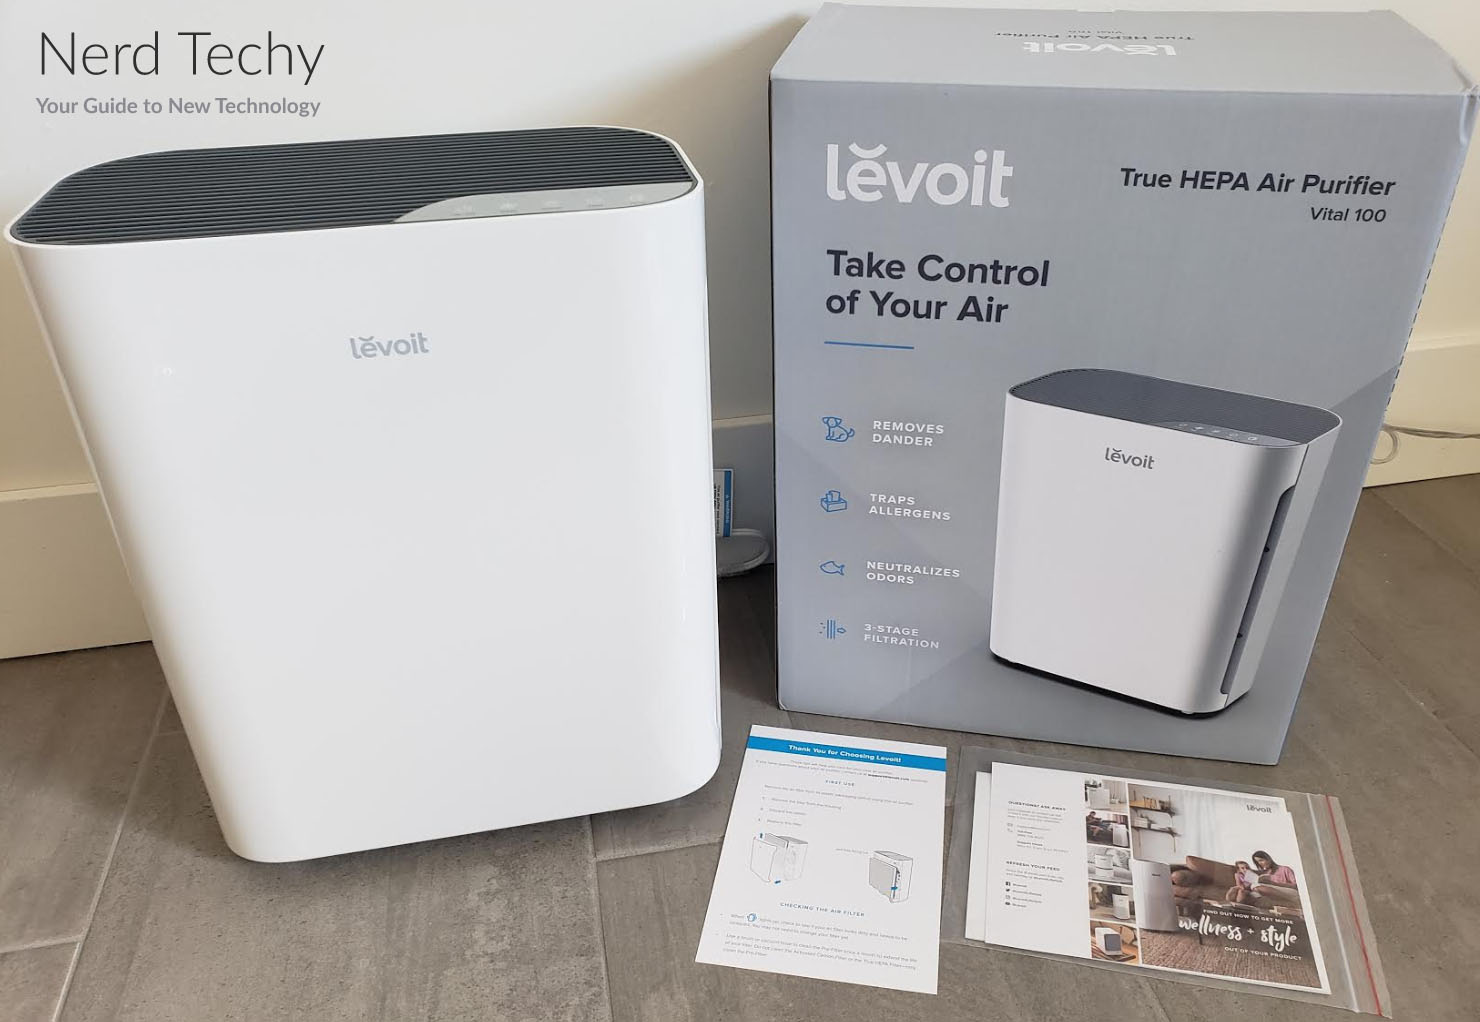 Levoit-Vital-100